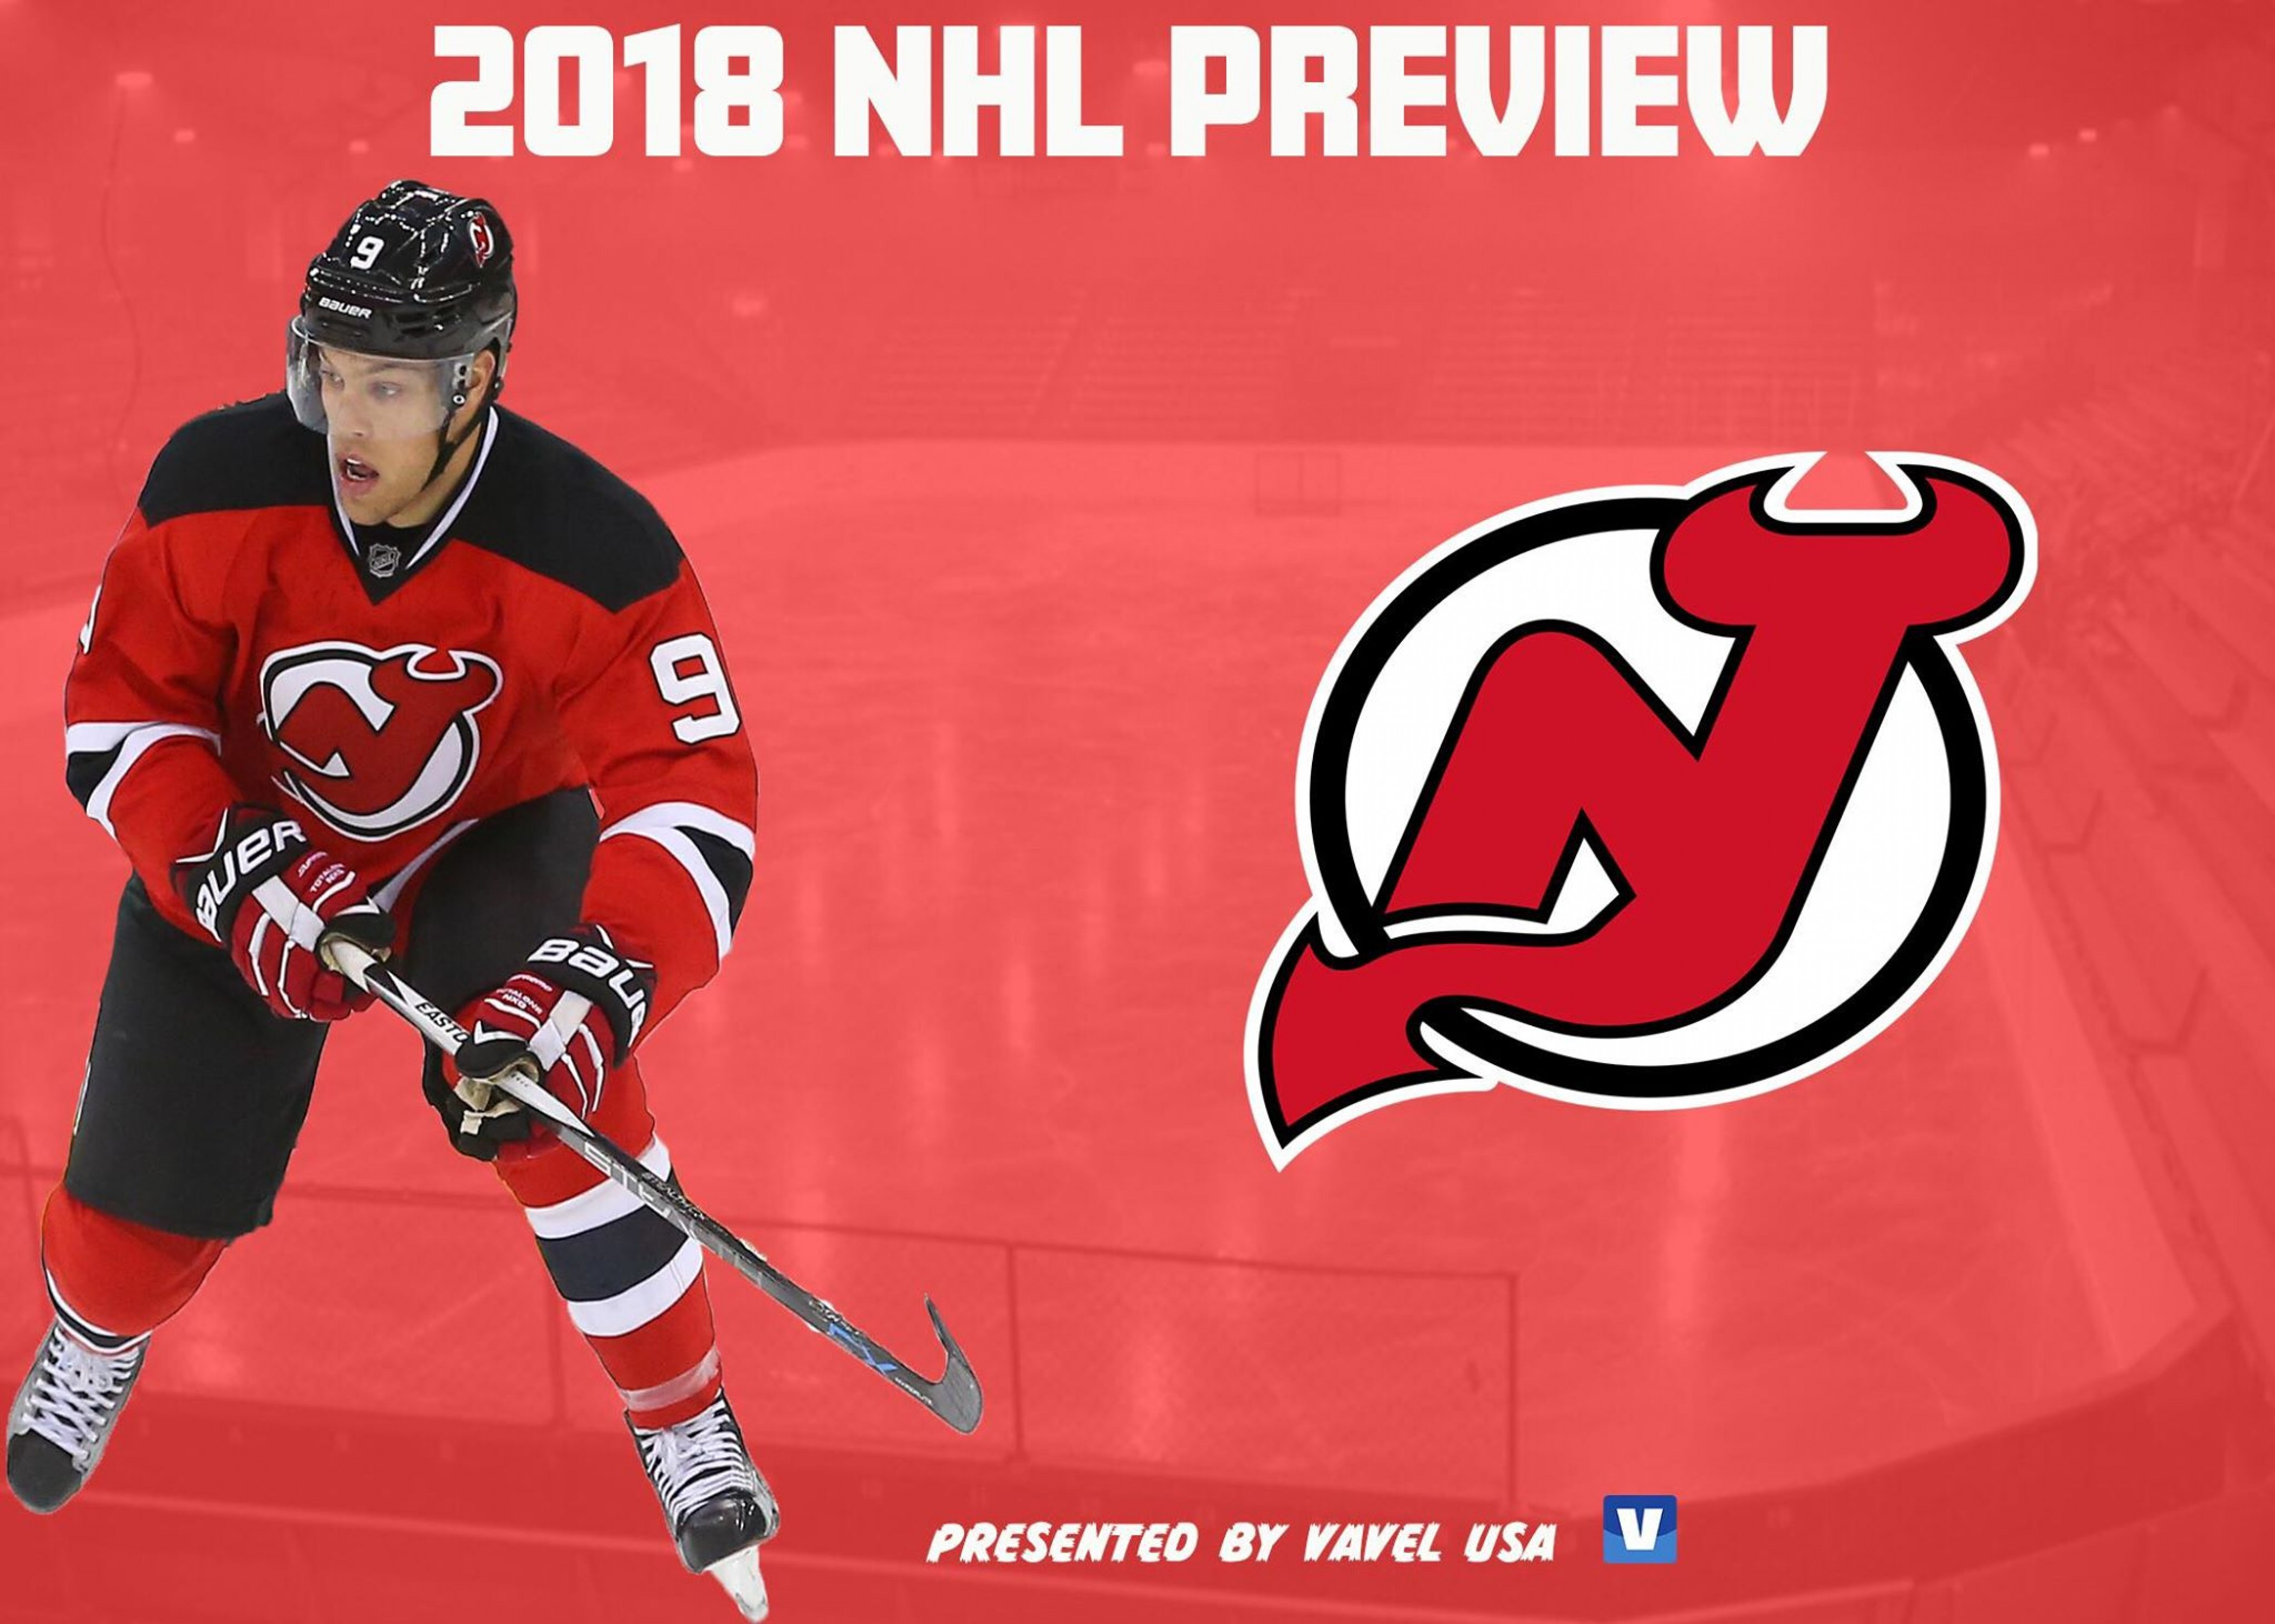 0dea3ed80 New Jersey Devils  NHL 2018 19 season preview - VAVEL.com